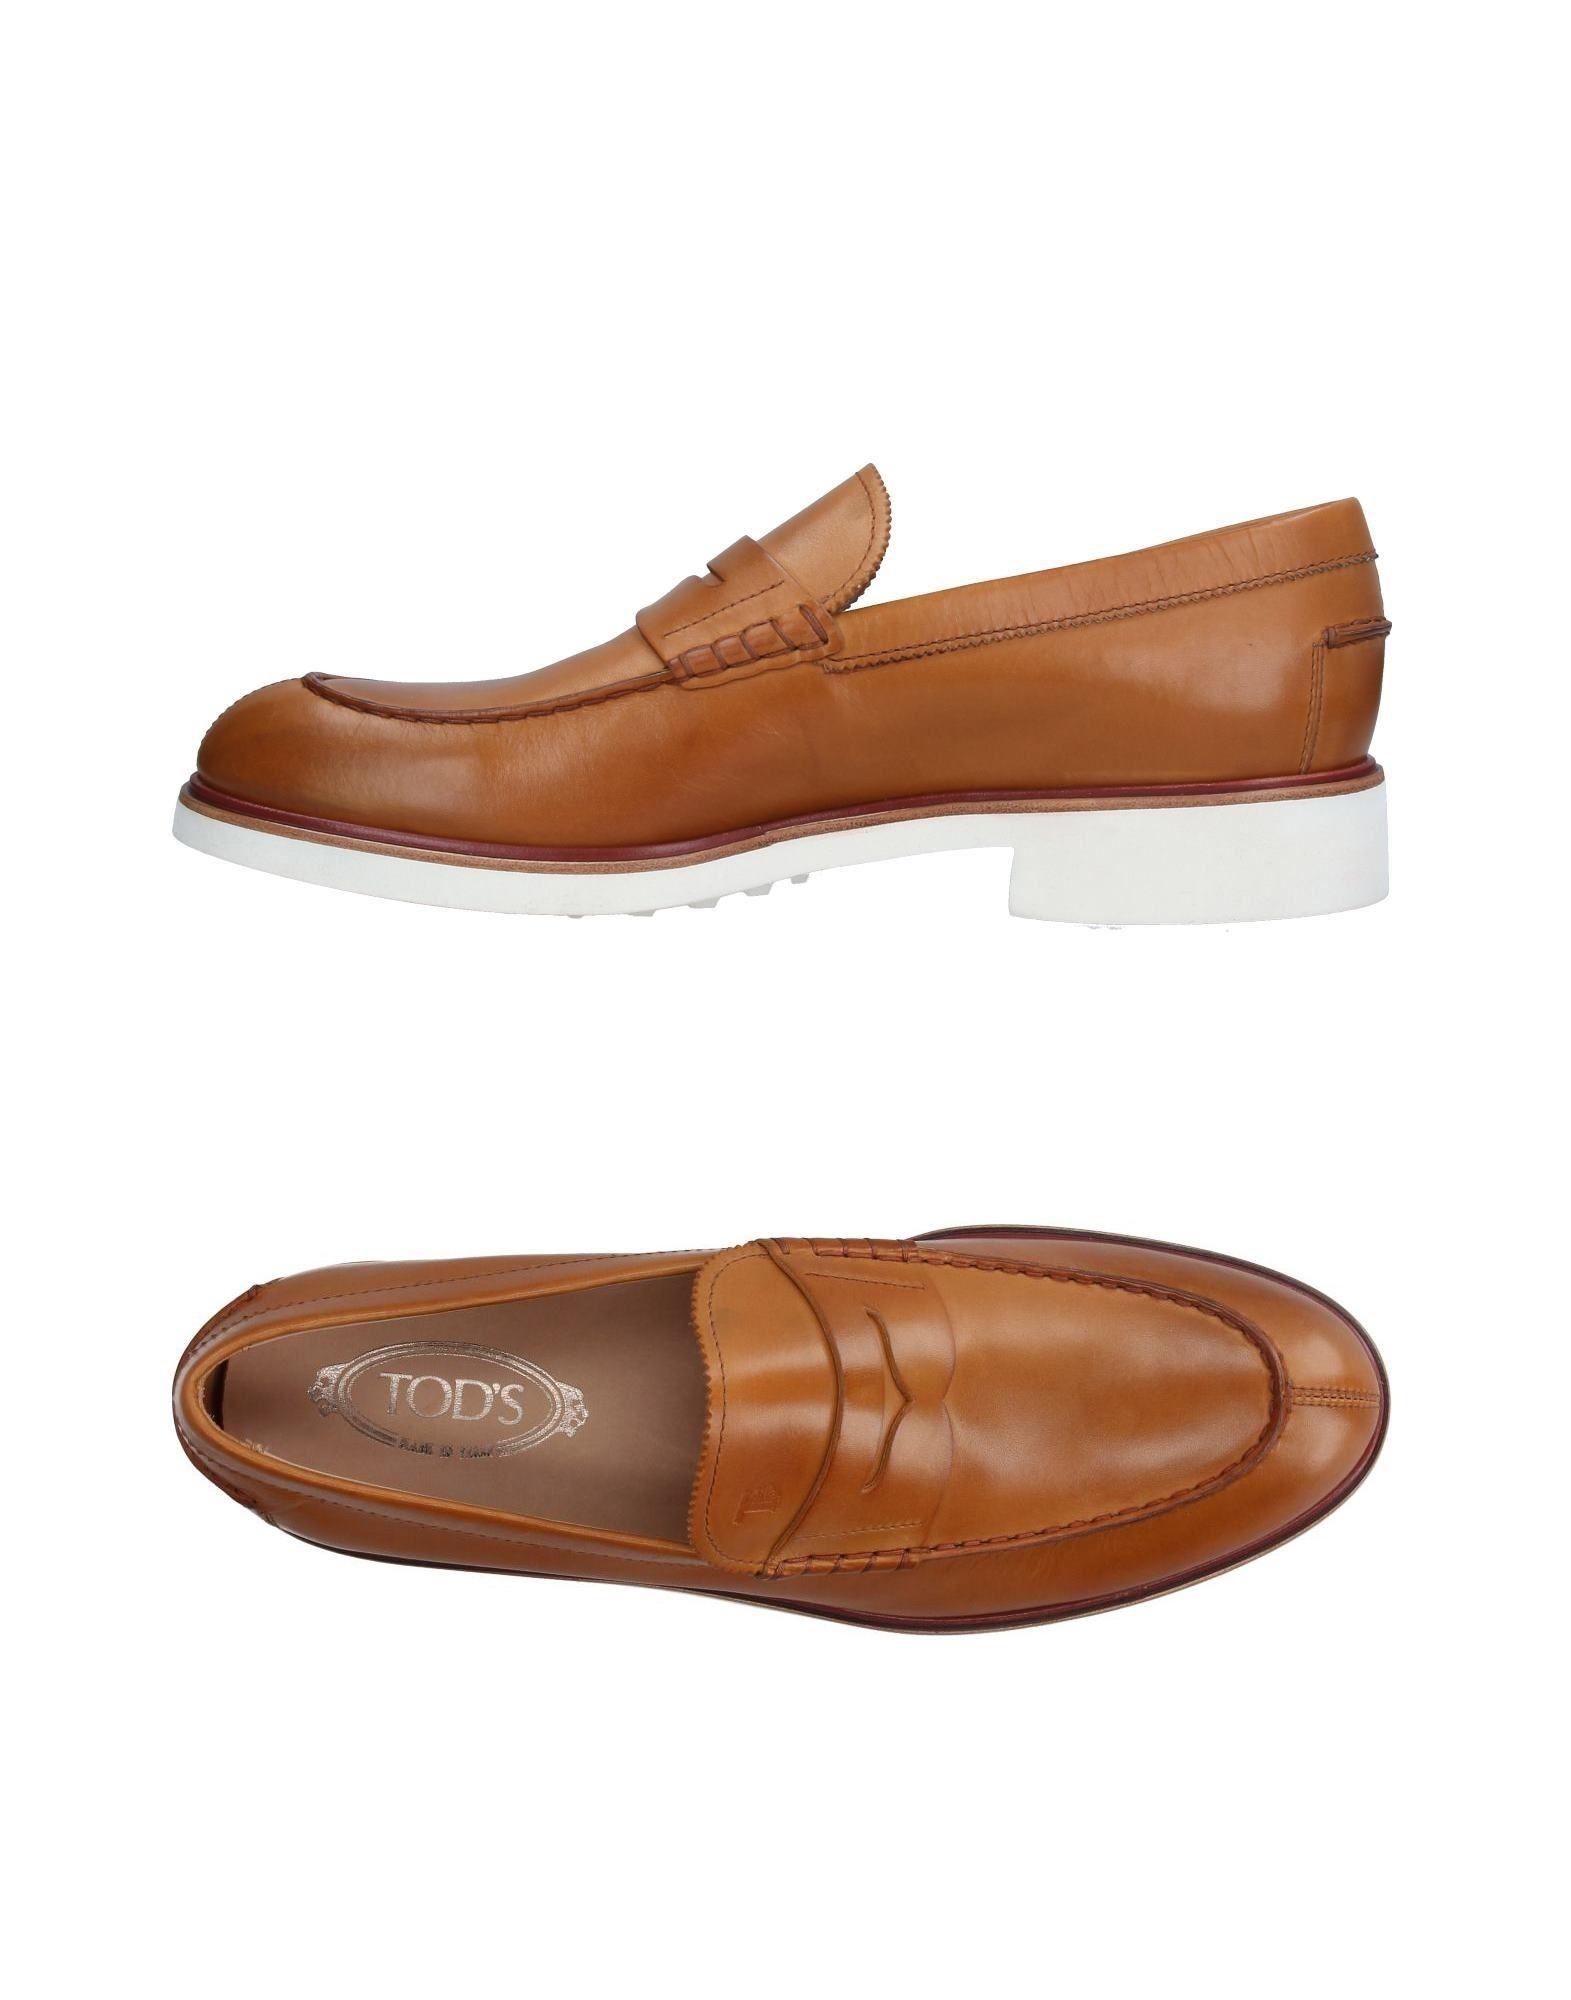 Tod's Mokassins Herren  11225500FA Gute Qualität beliebte Schuhe